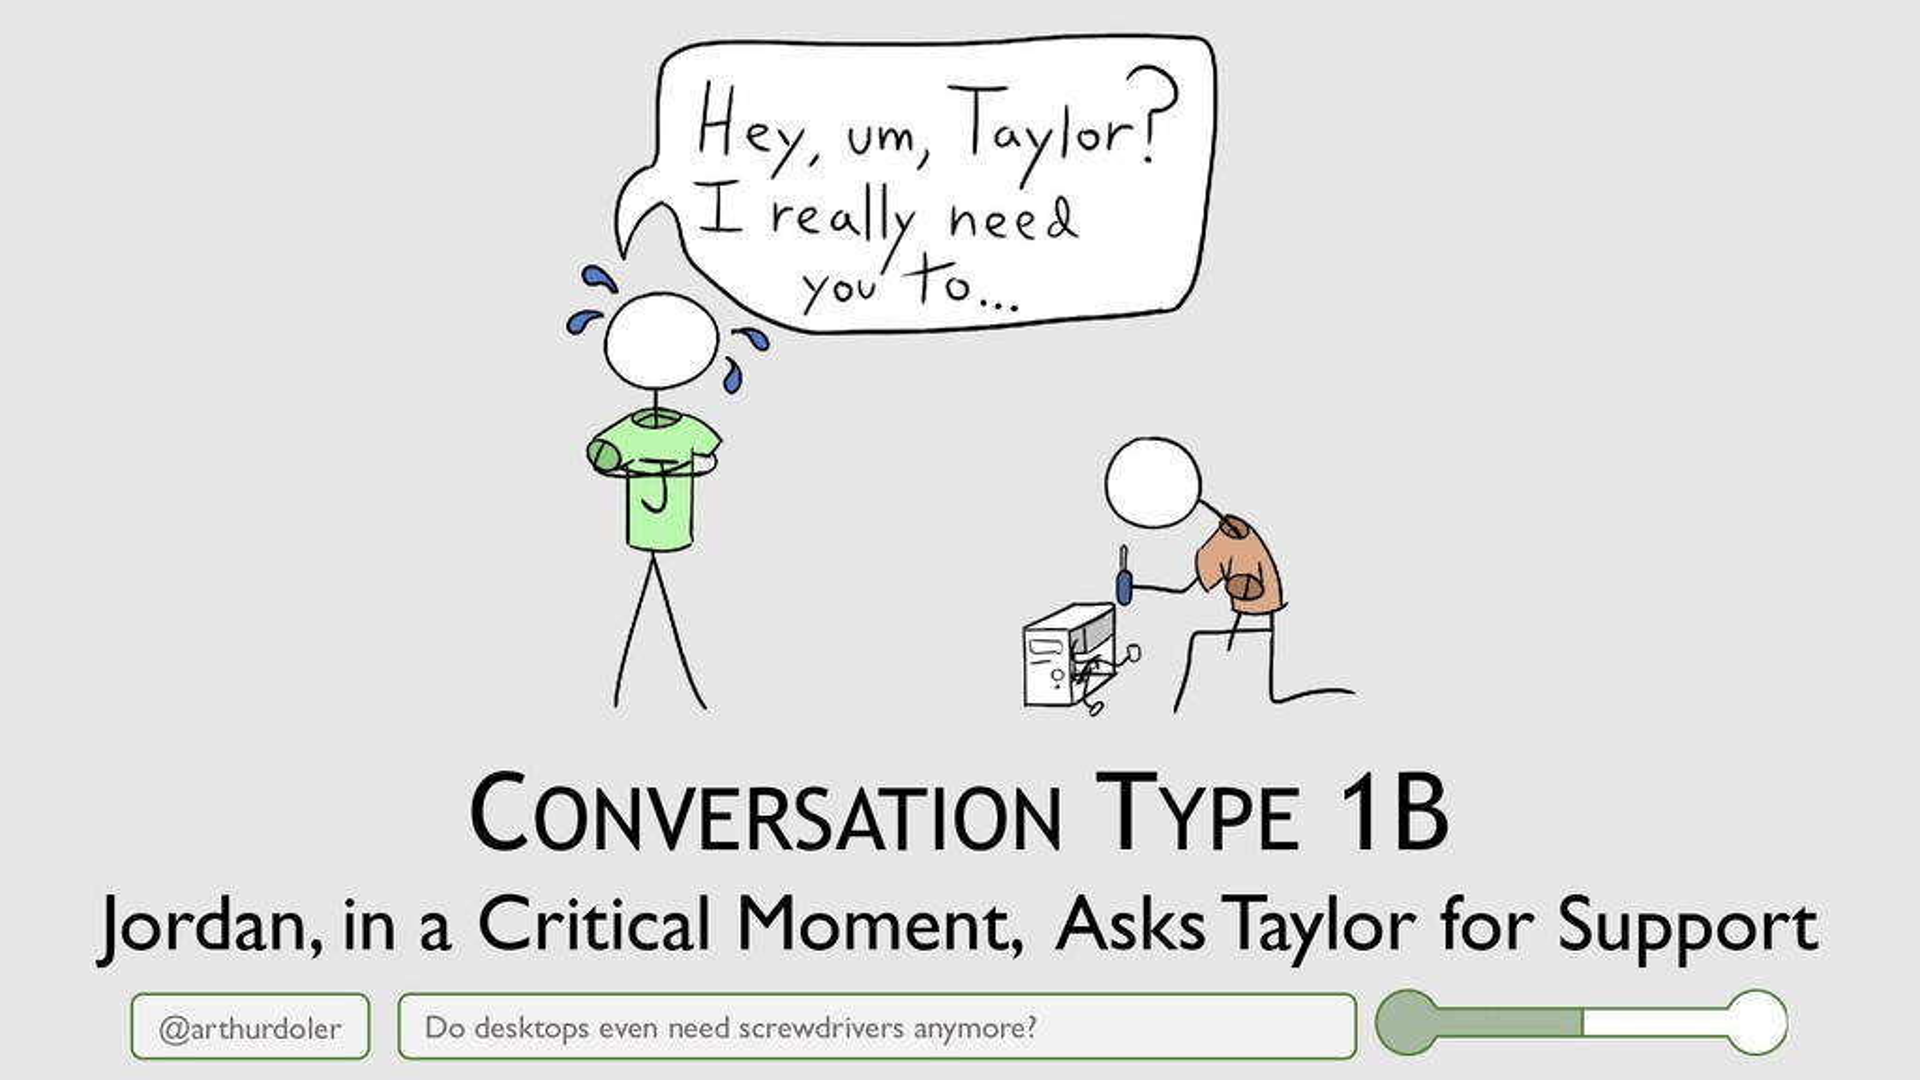 @arthurdoler CONVERSATION TYPE 1B Do desktops e...